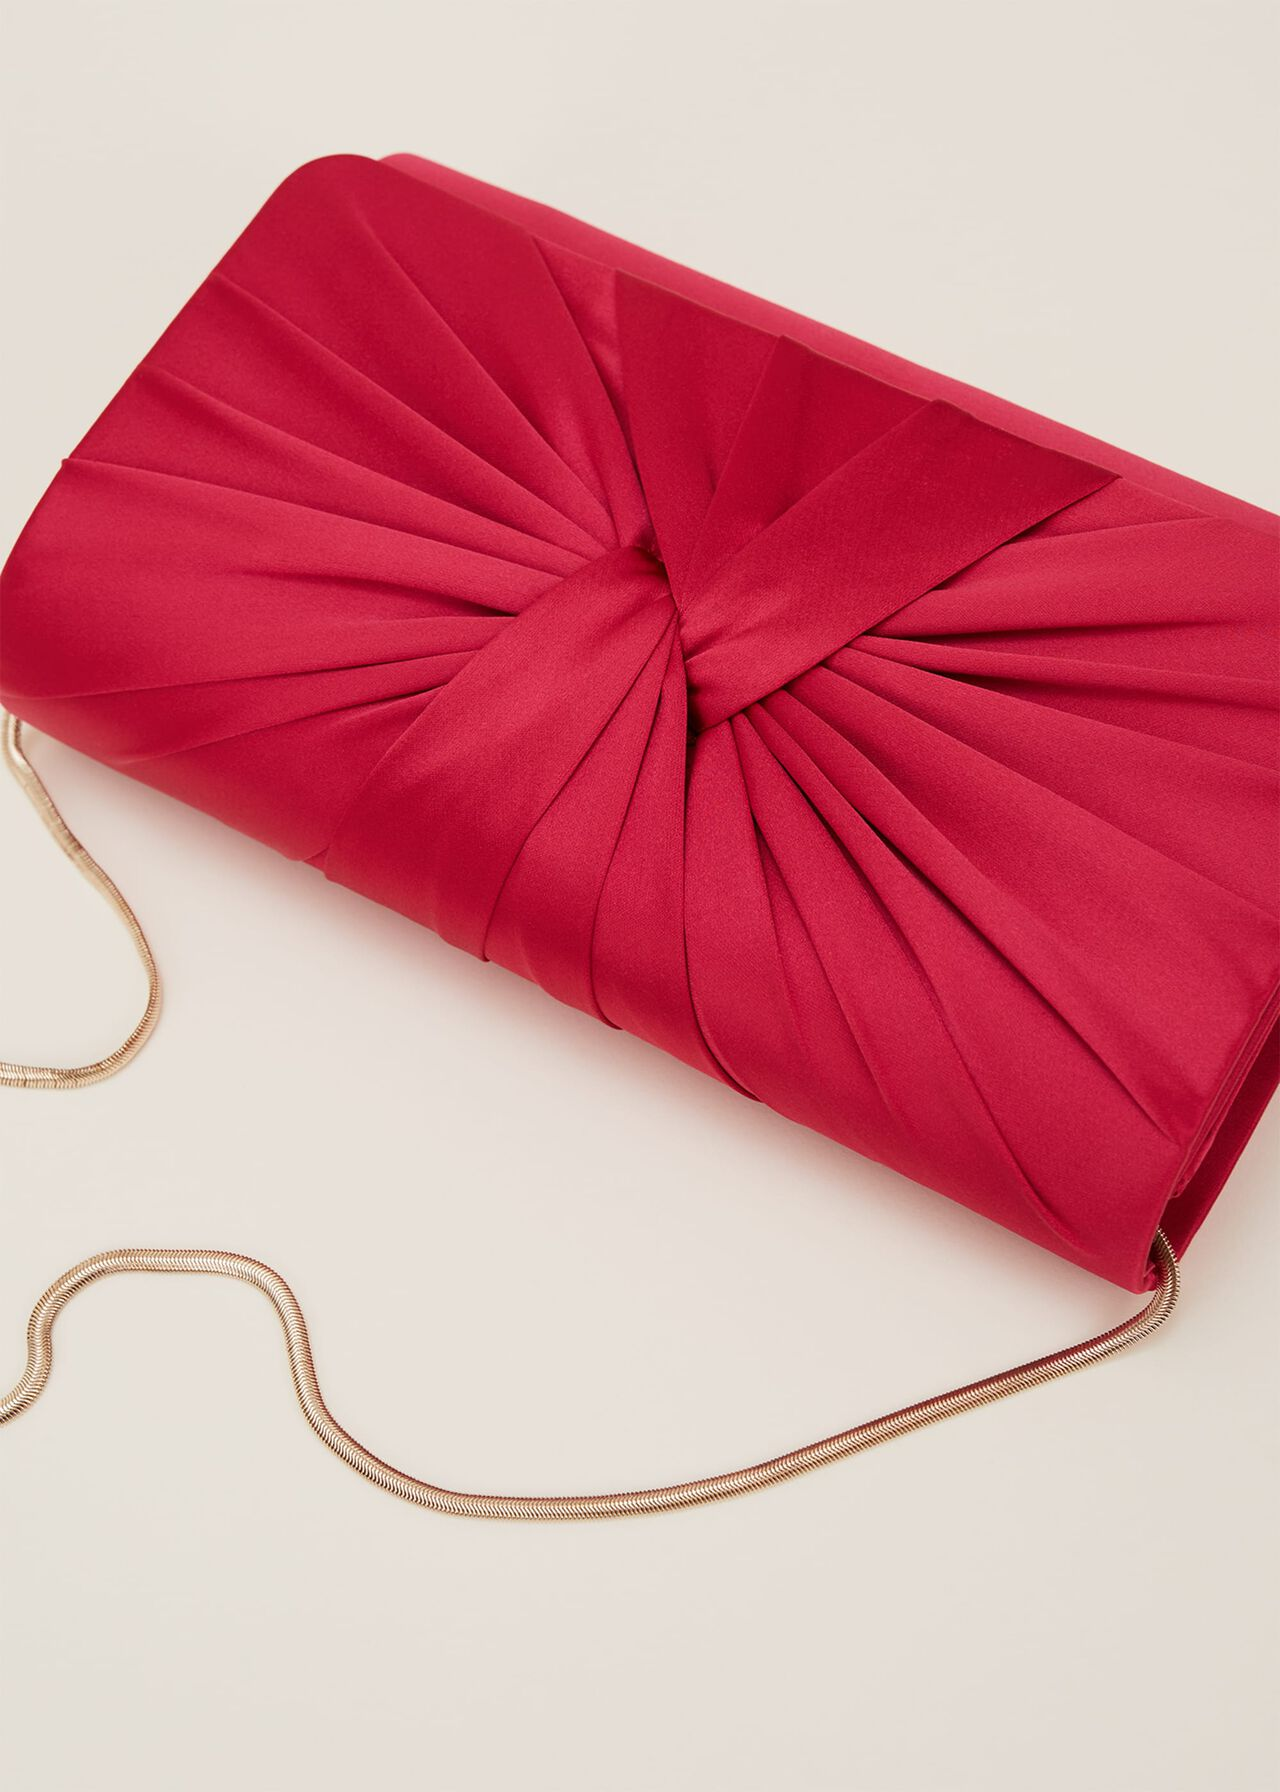 Gemma Clutch Bag